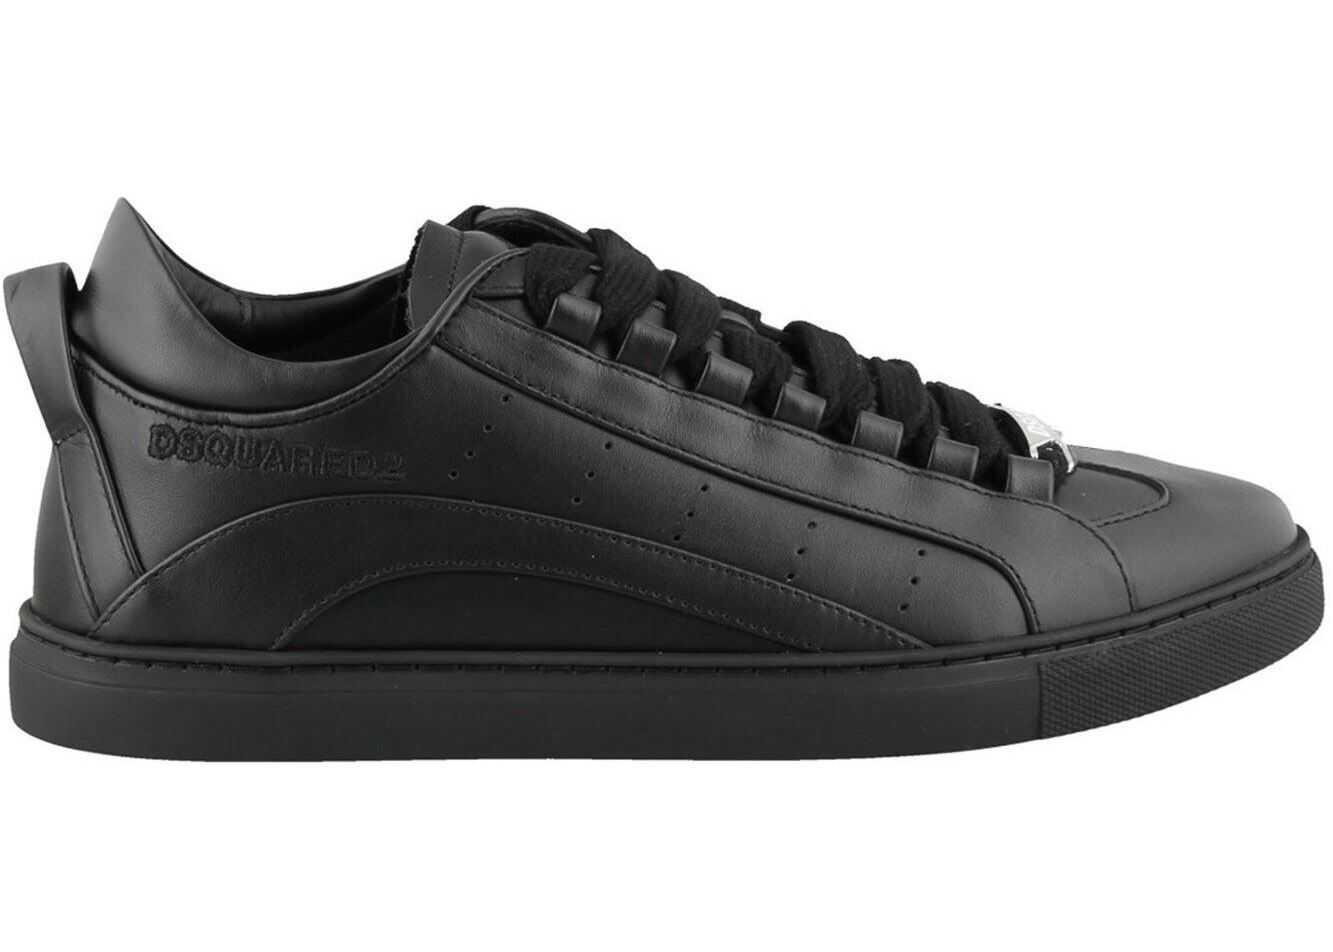 DSQUARED2 251 Black Low Top Sneakers Black